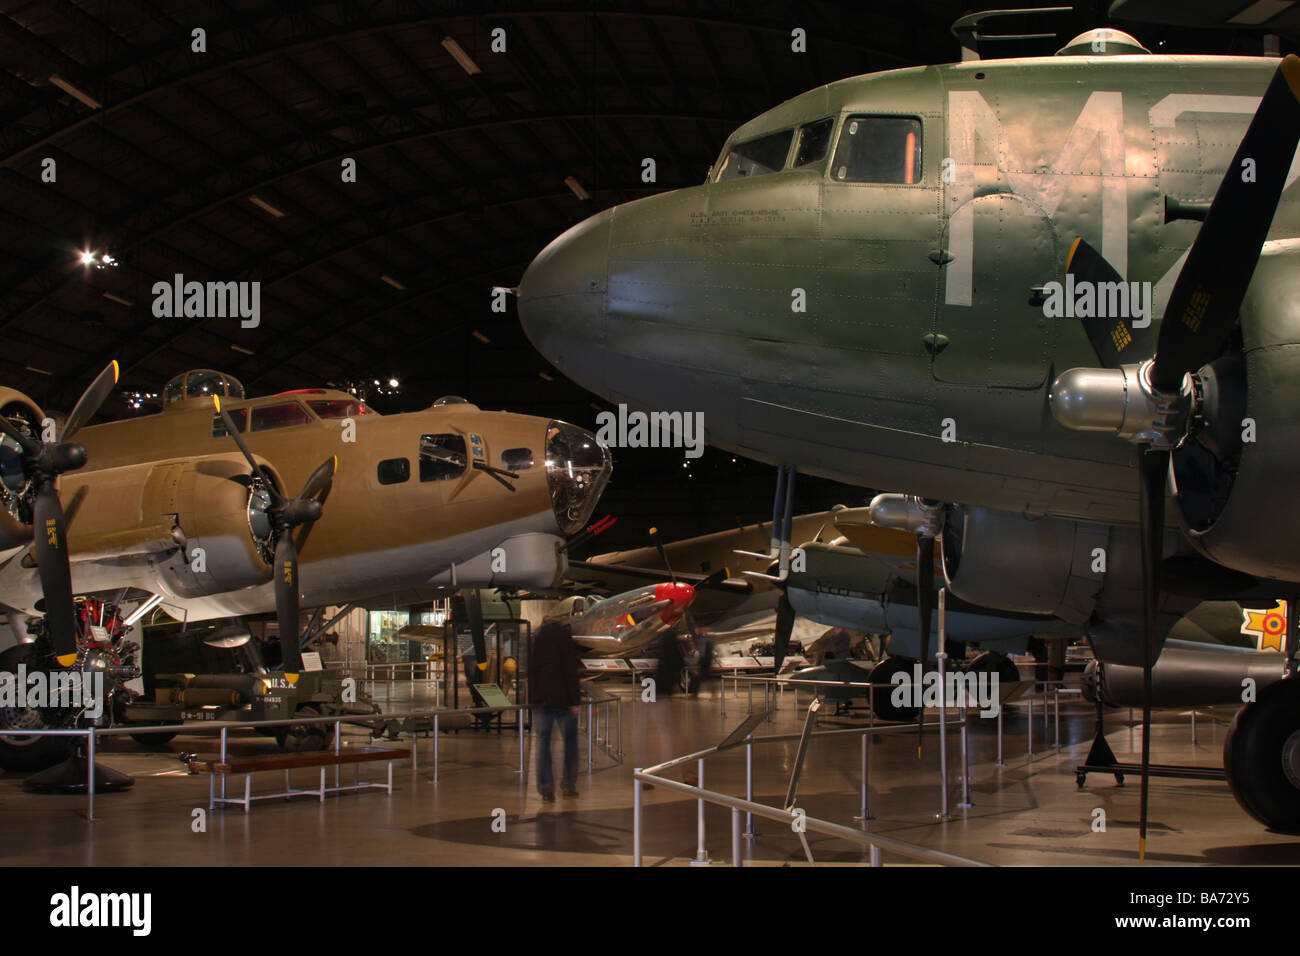 United States Air Force Museum Dayton Ohio Wright Patterson Air - United states air force bases